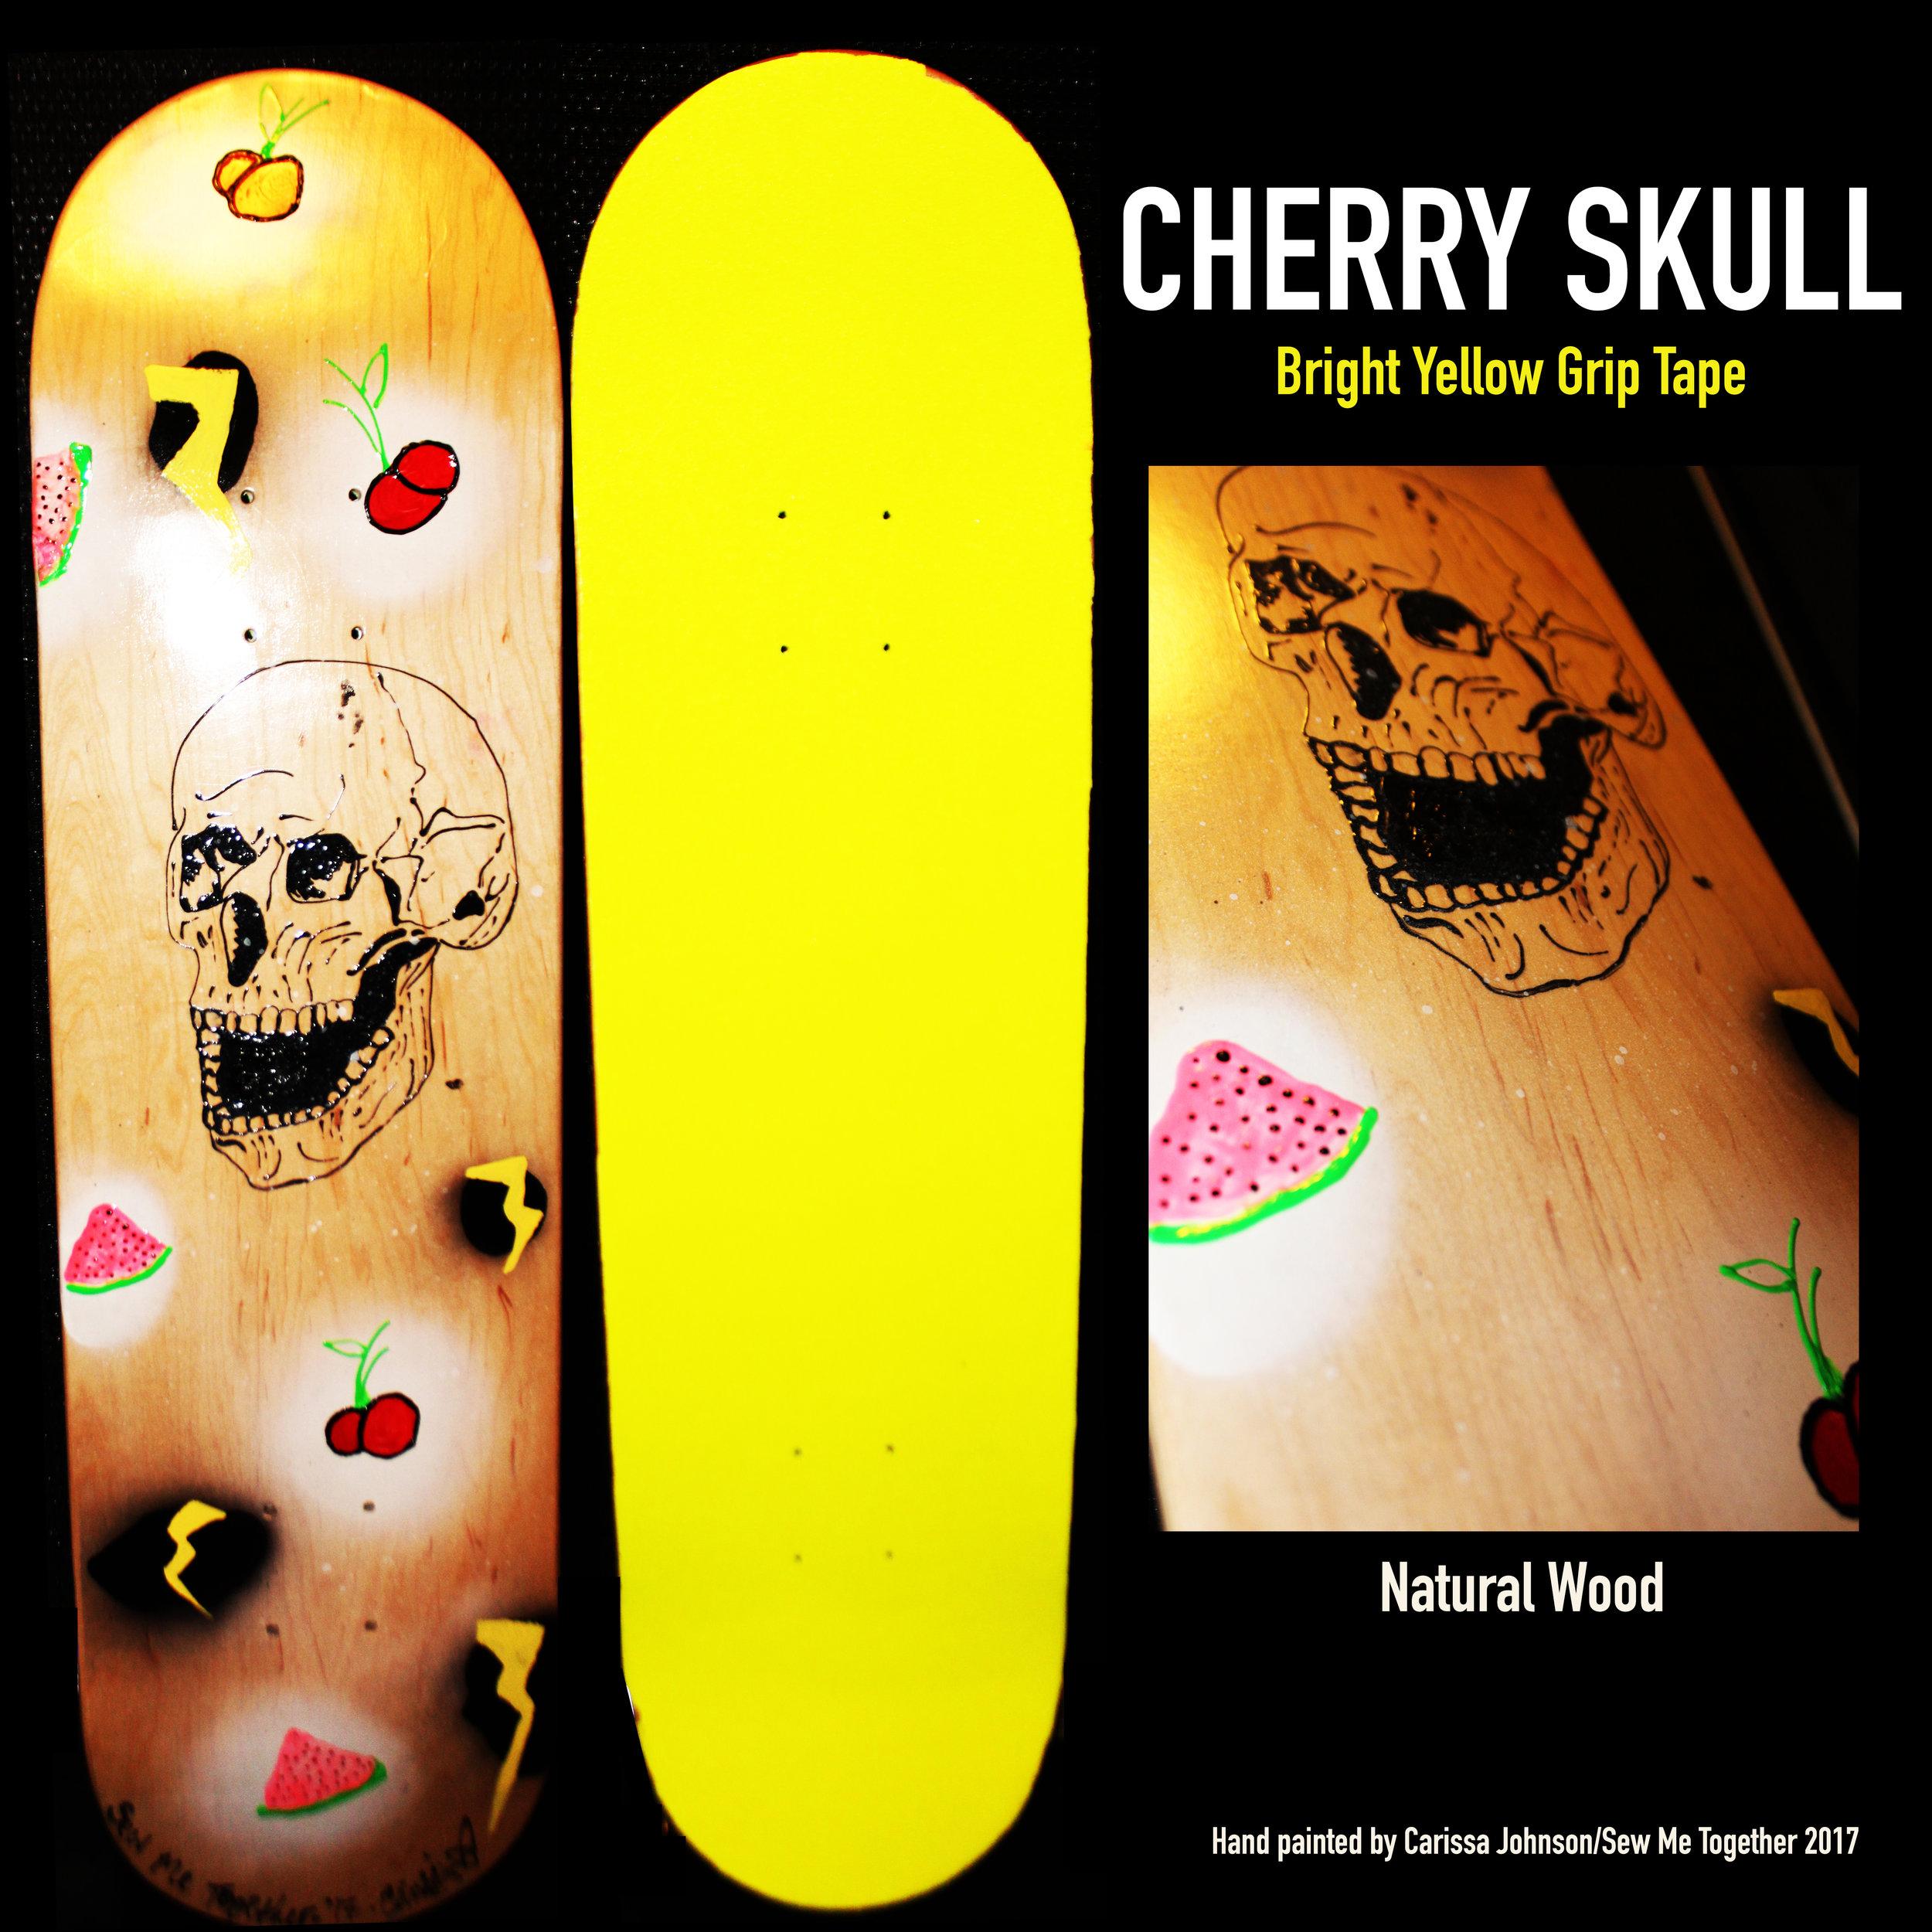 Cherry Skull